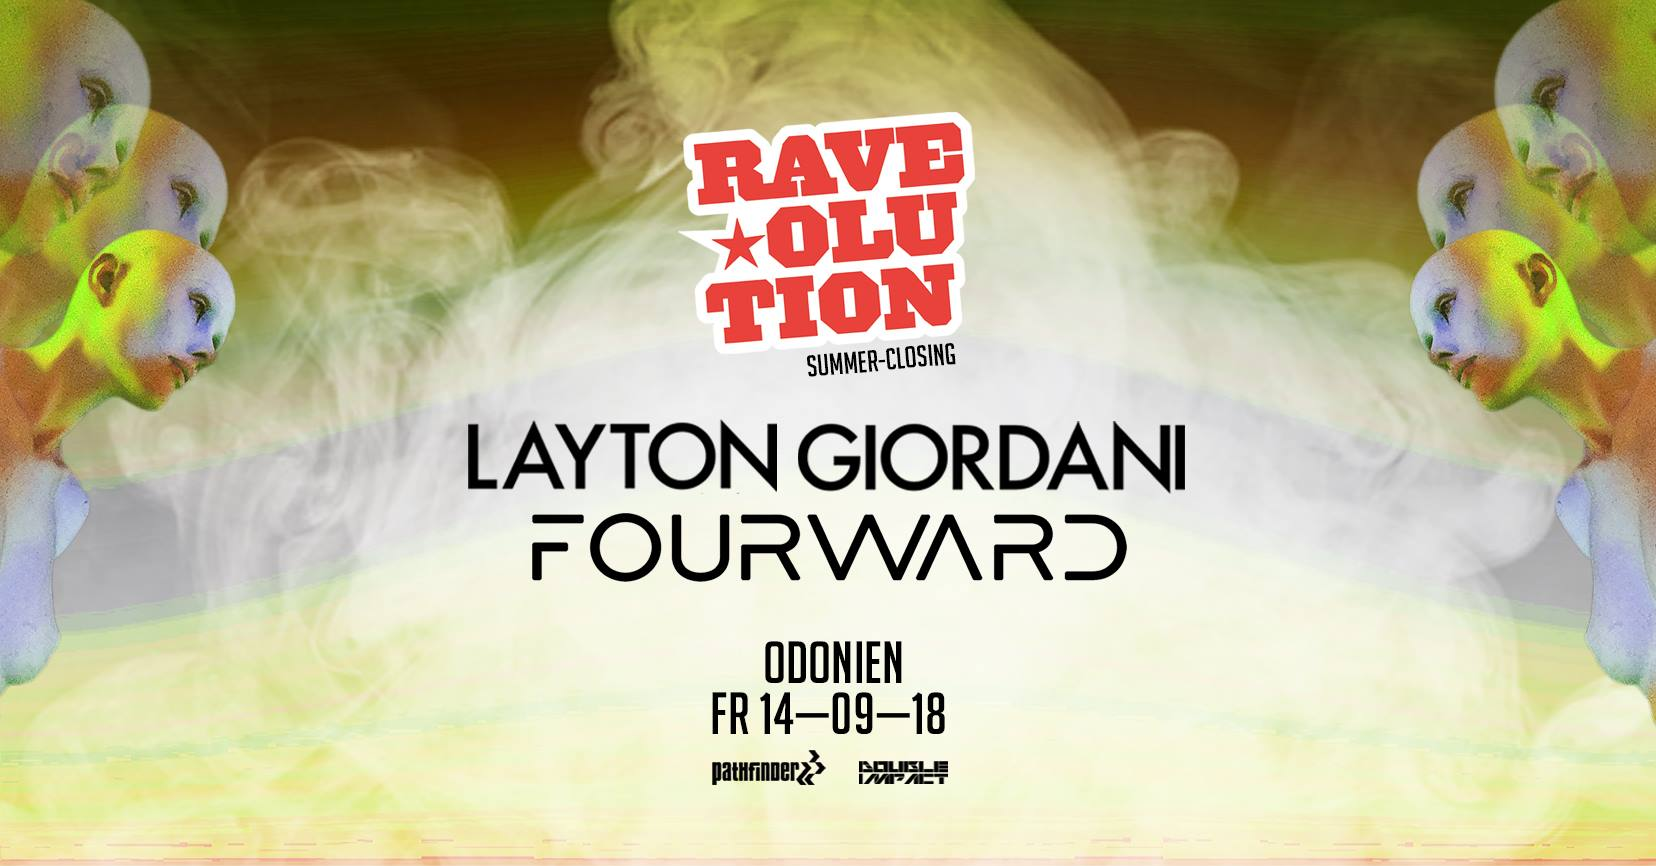 Raveolution Summer Closing ft. Fourward & Layton Giordani